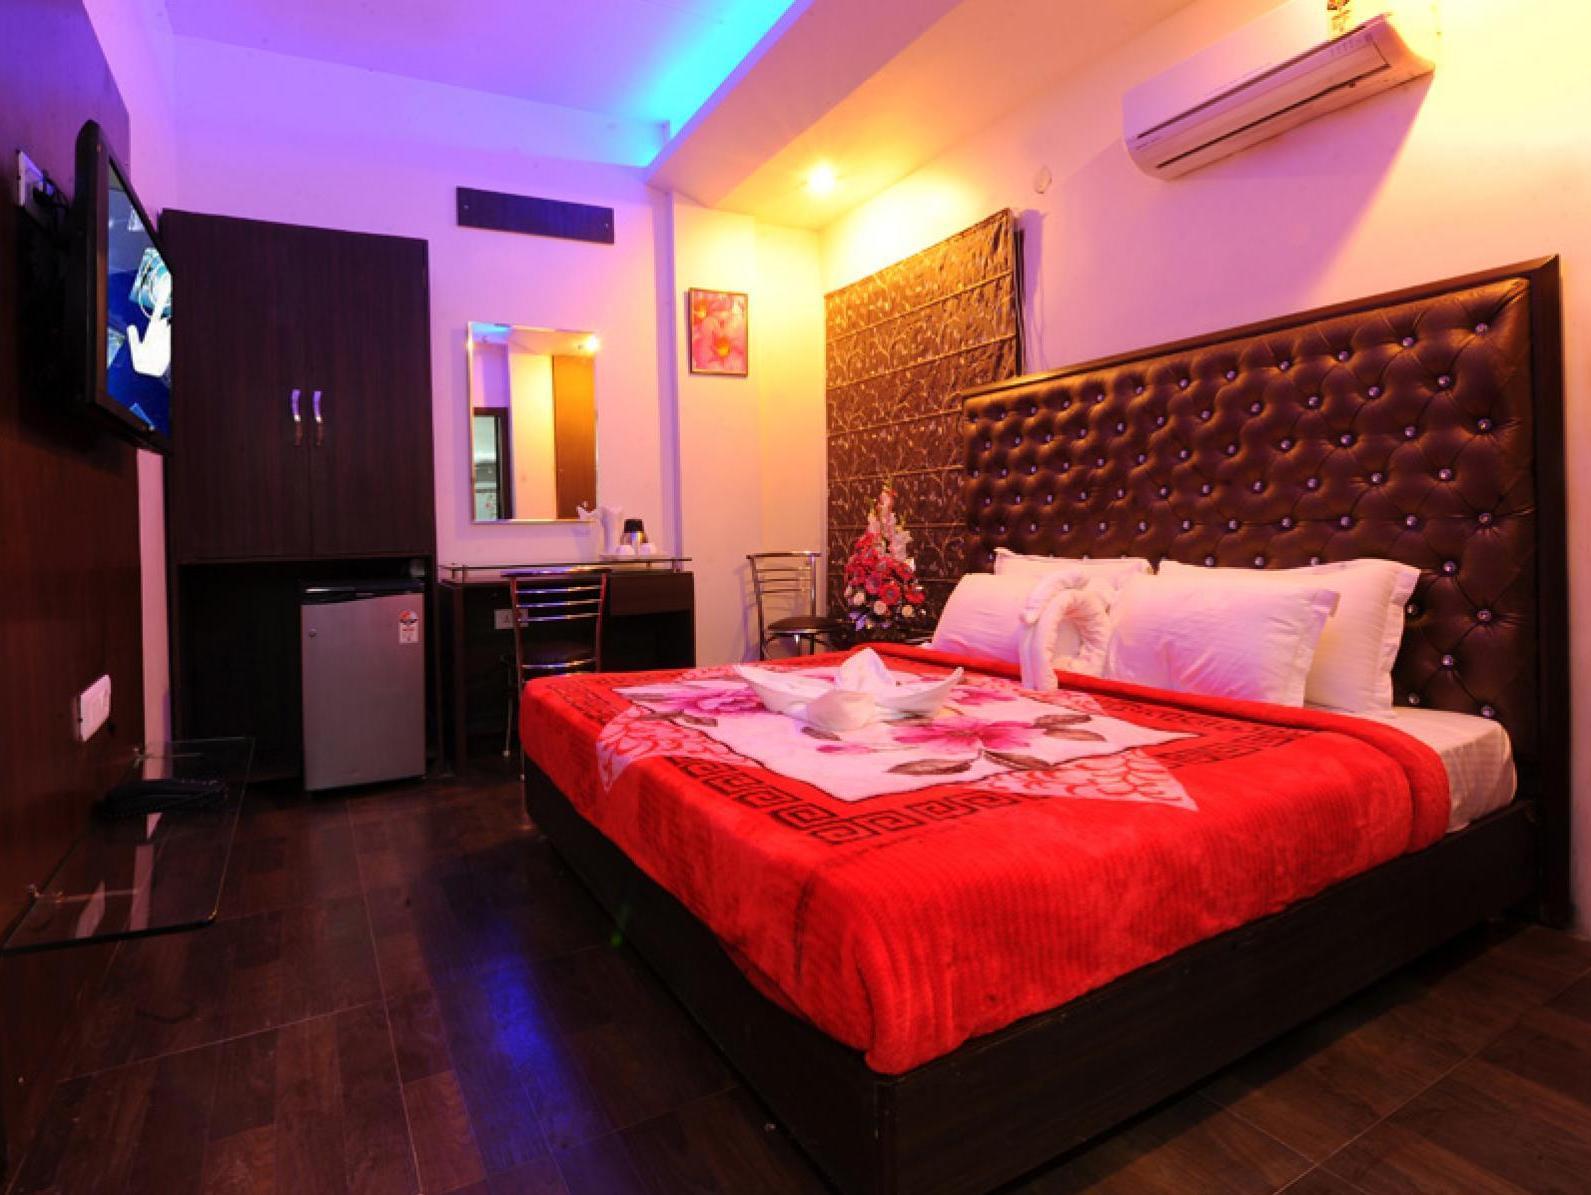 Hotel Pearl Inn & Suites - Amritsar